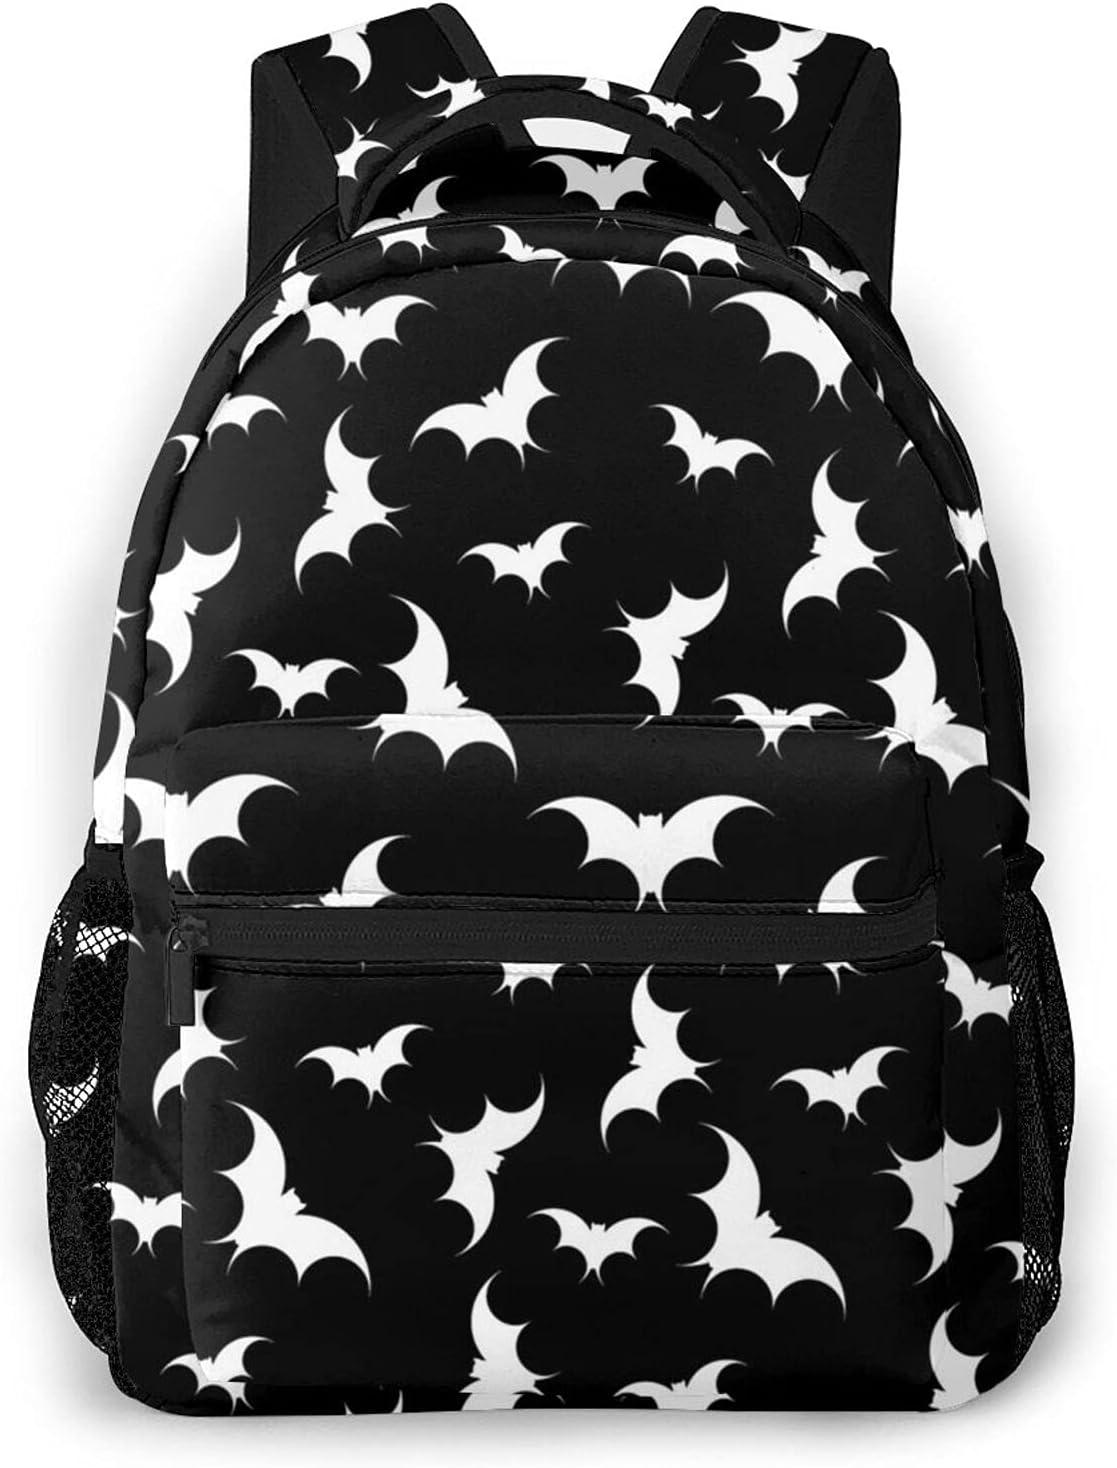 Bats At the price Seamless Travel Daypack Student Rucksack Ranking TOP2 Backpack Laptop Li